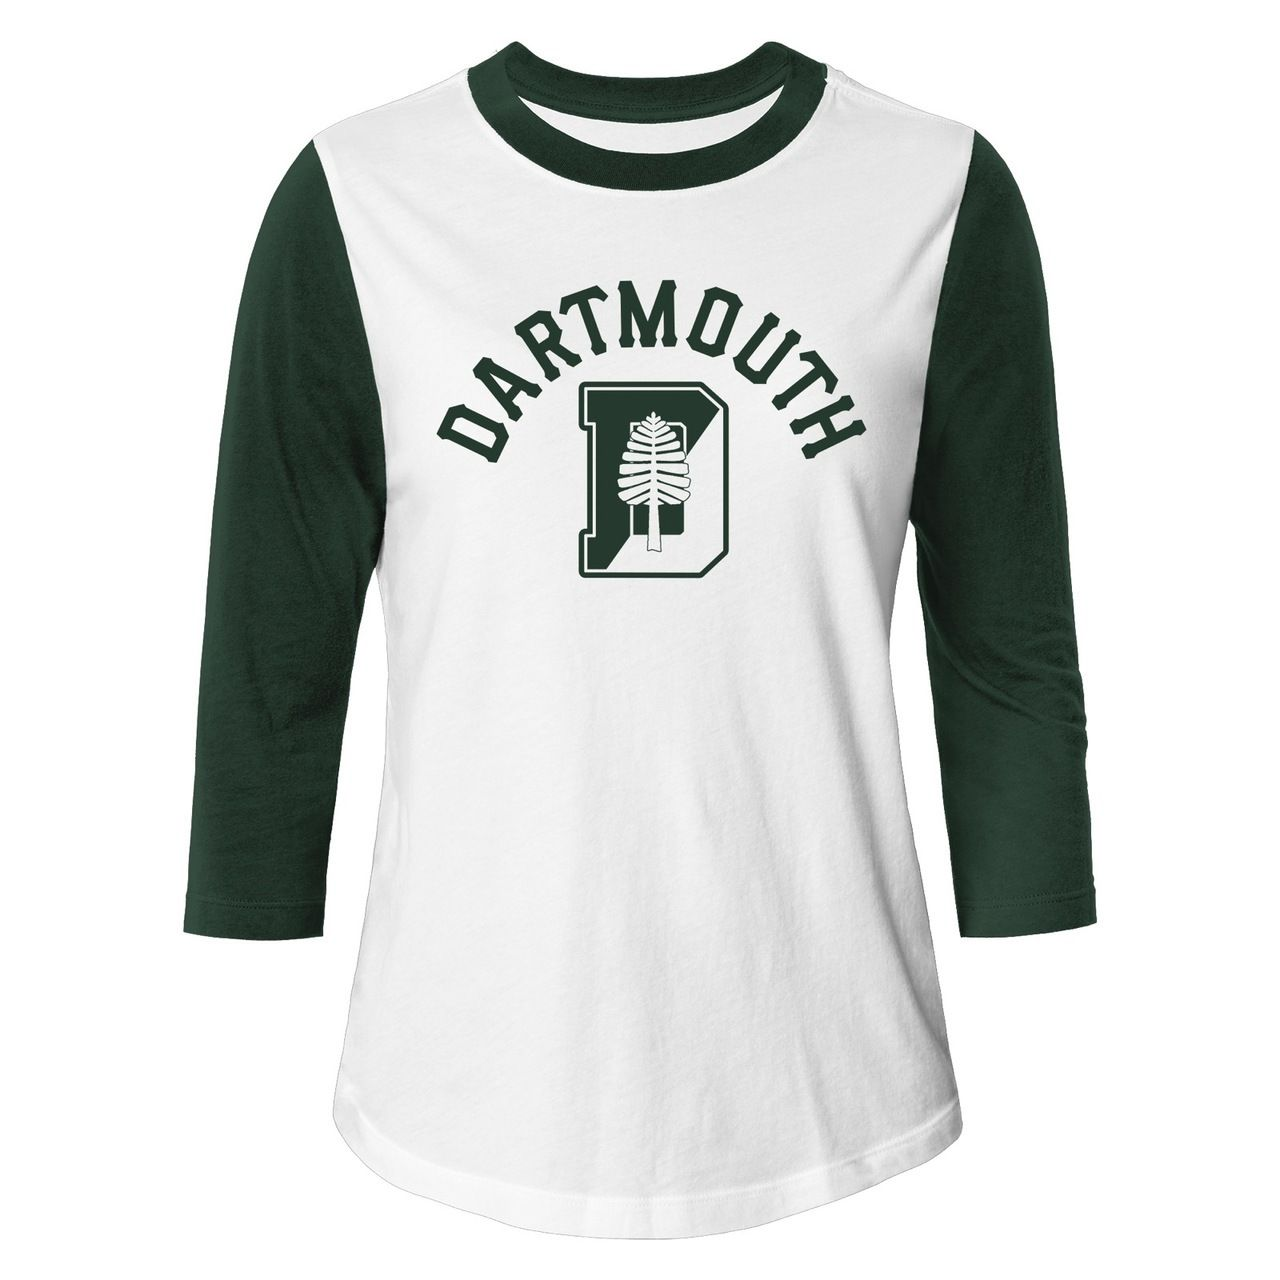 Women S Freshy Kickball Tee Dartmouth Coop Dartmouth College Store Dartmouth Apparel Long Sleeve Tshirt Men Tees Women [ 1280 x 1280 Pixel ]